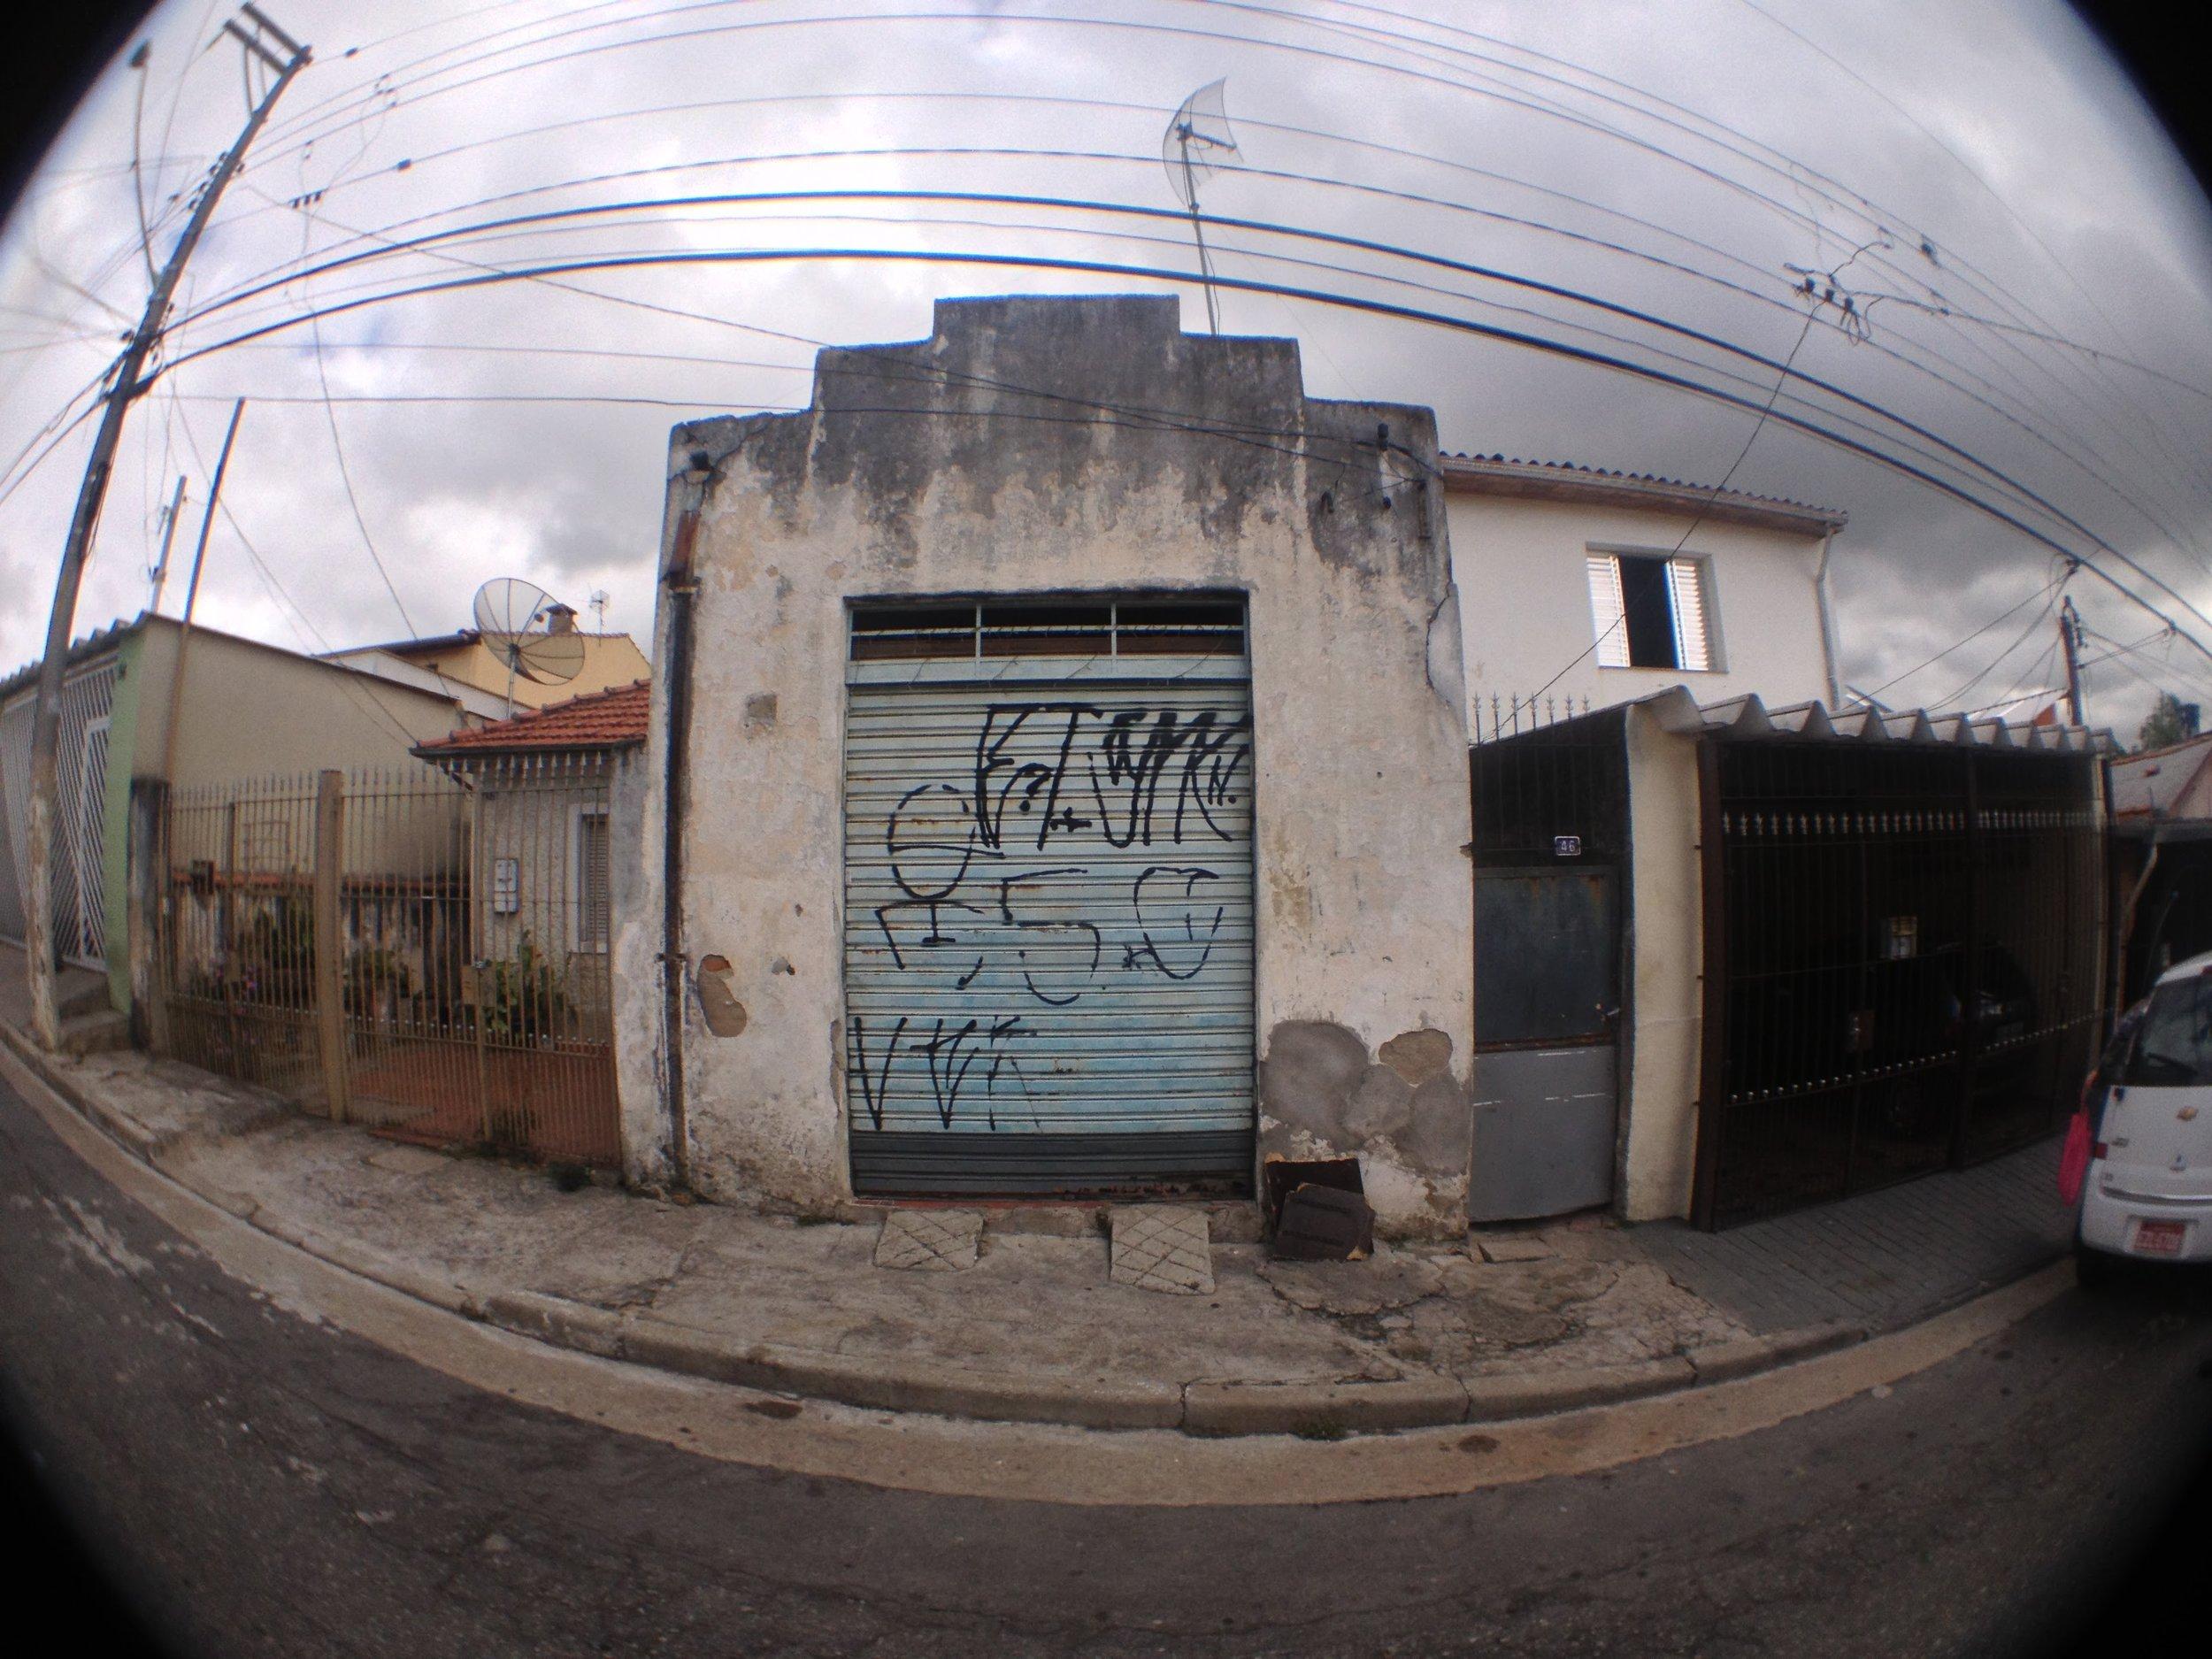 Deep diving into São Paulo's urban sprawl.